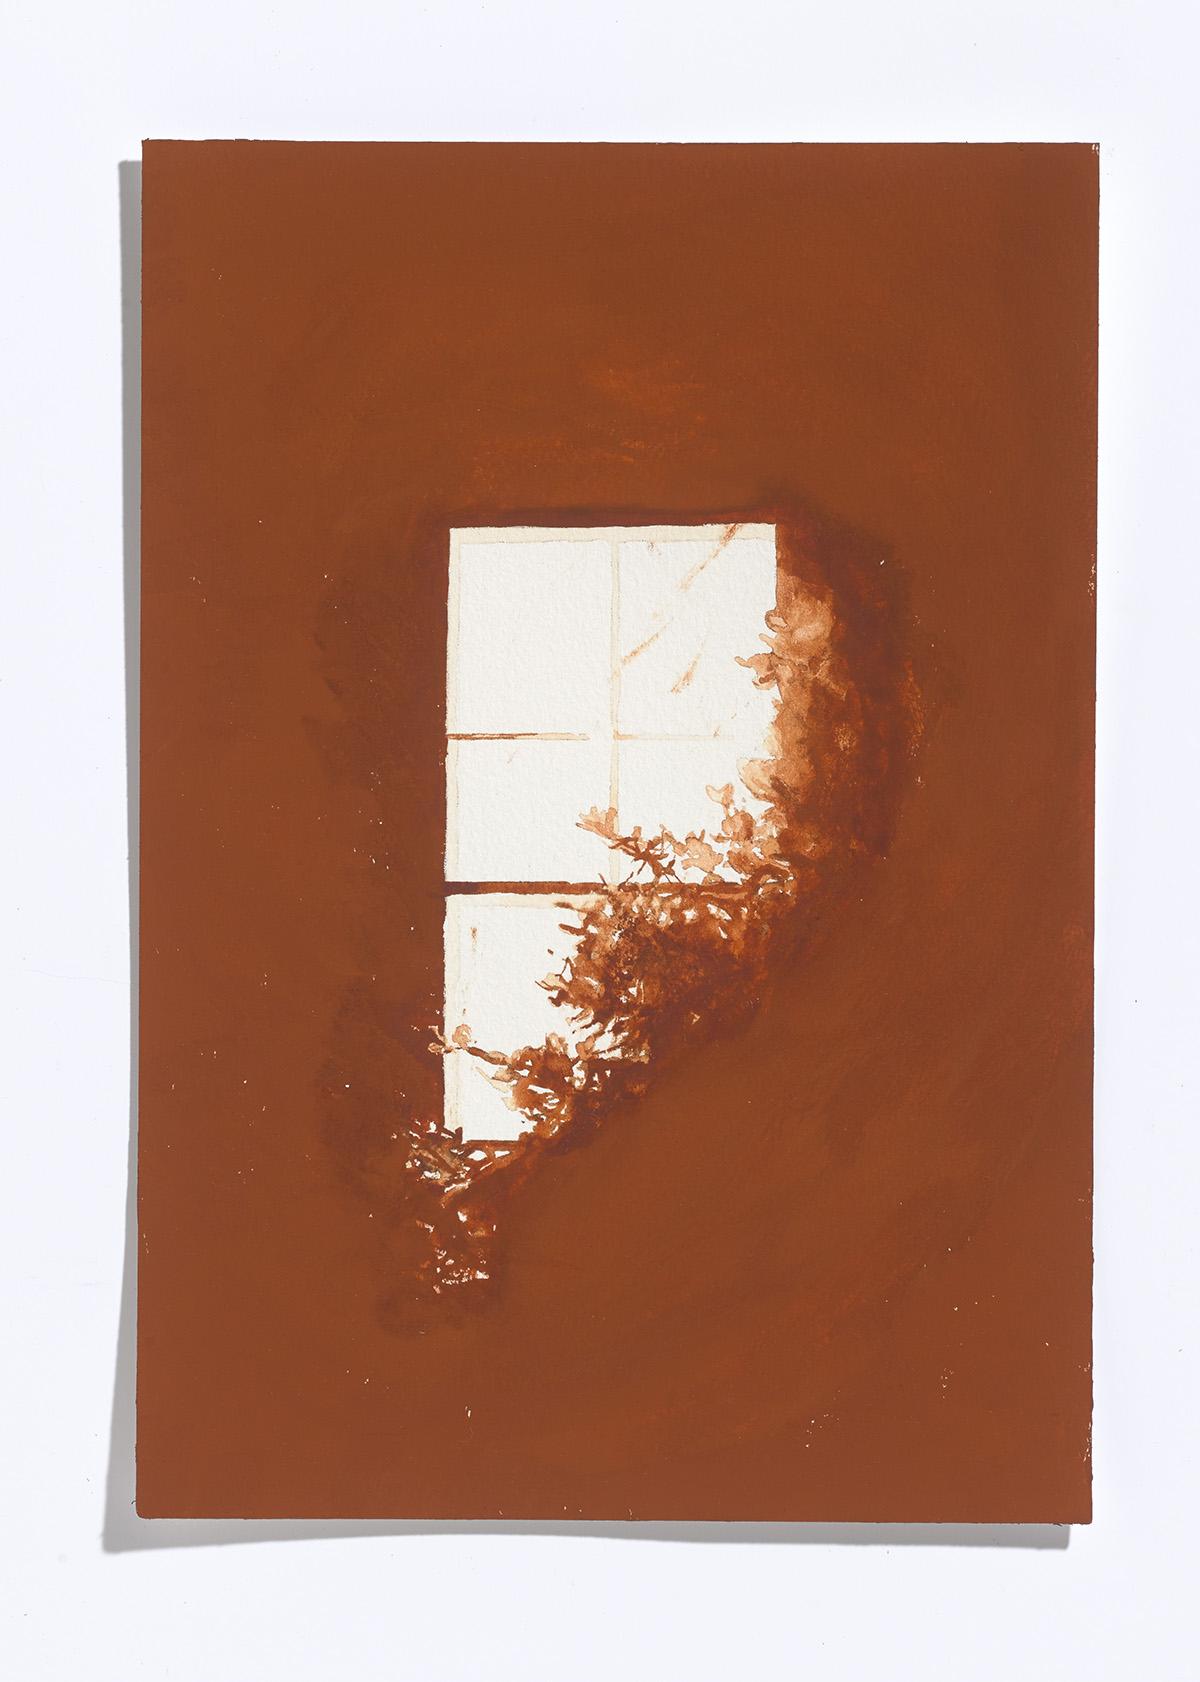 Rust window, 2017, gouache on paper,10.25 x 7 1/8 in.$1000 CAD $800 USD